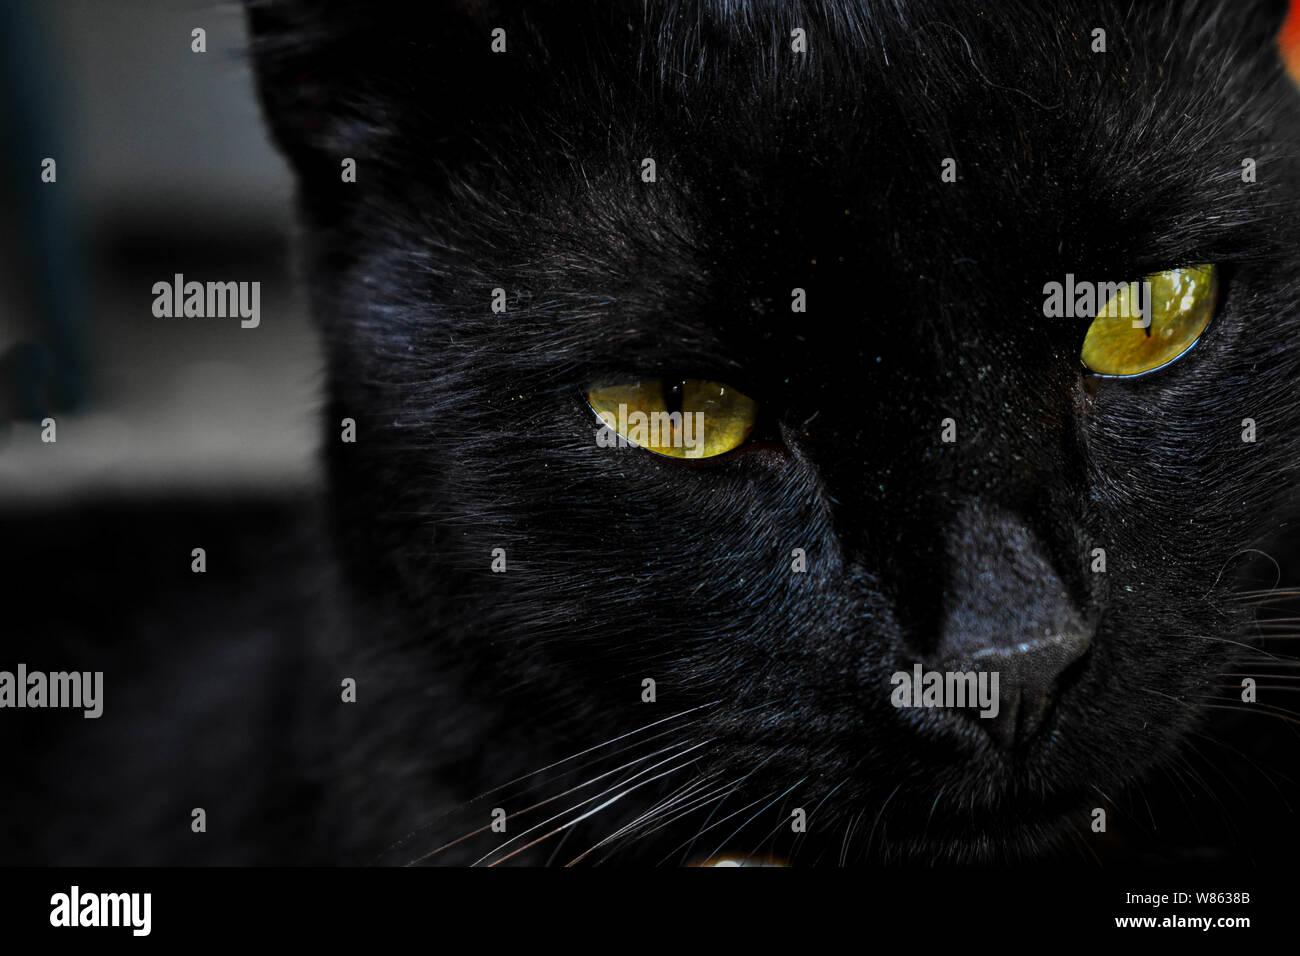 Closeup portrait of beautiful black cat whit green eyes Stock Photo